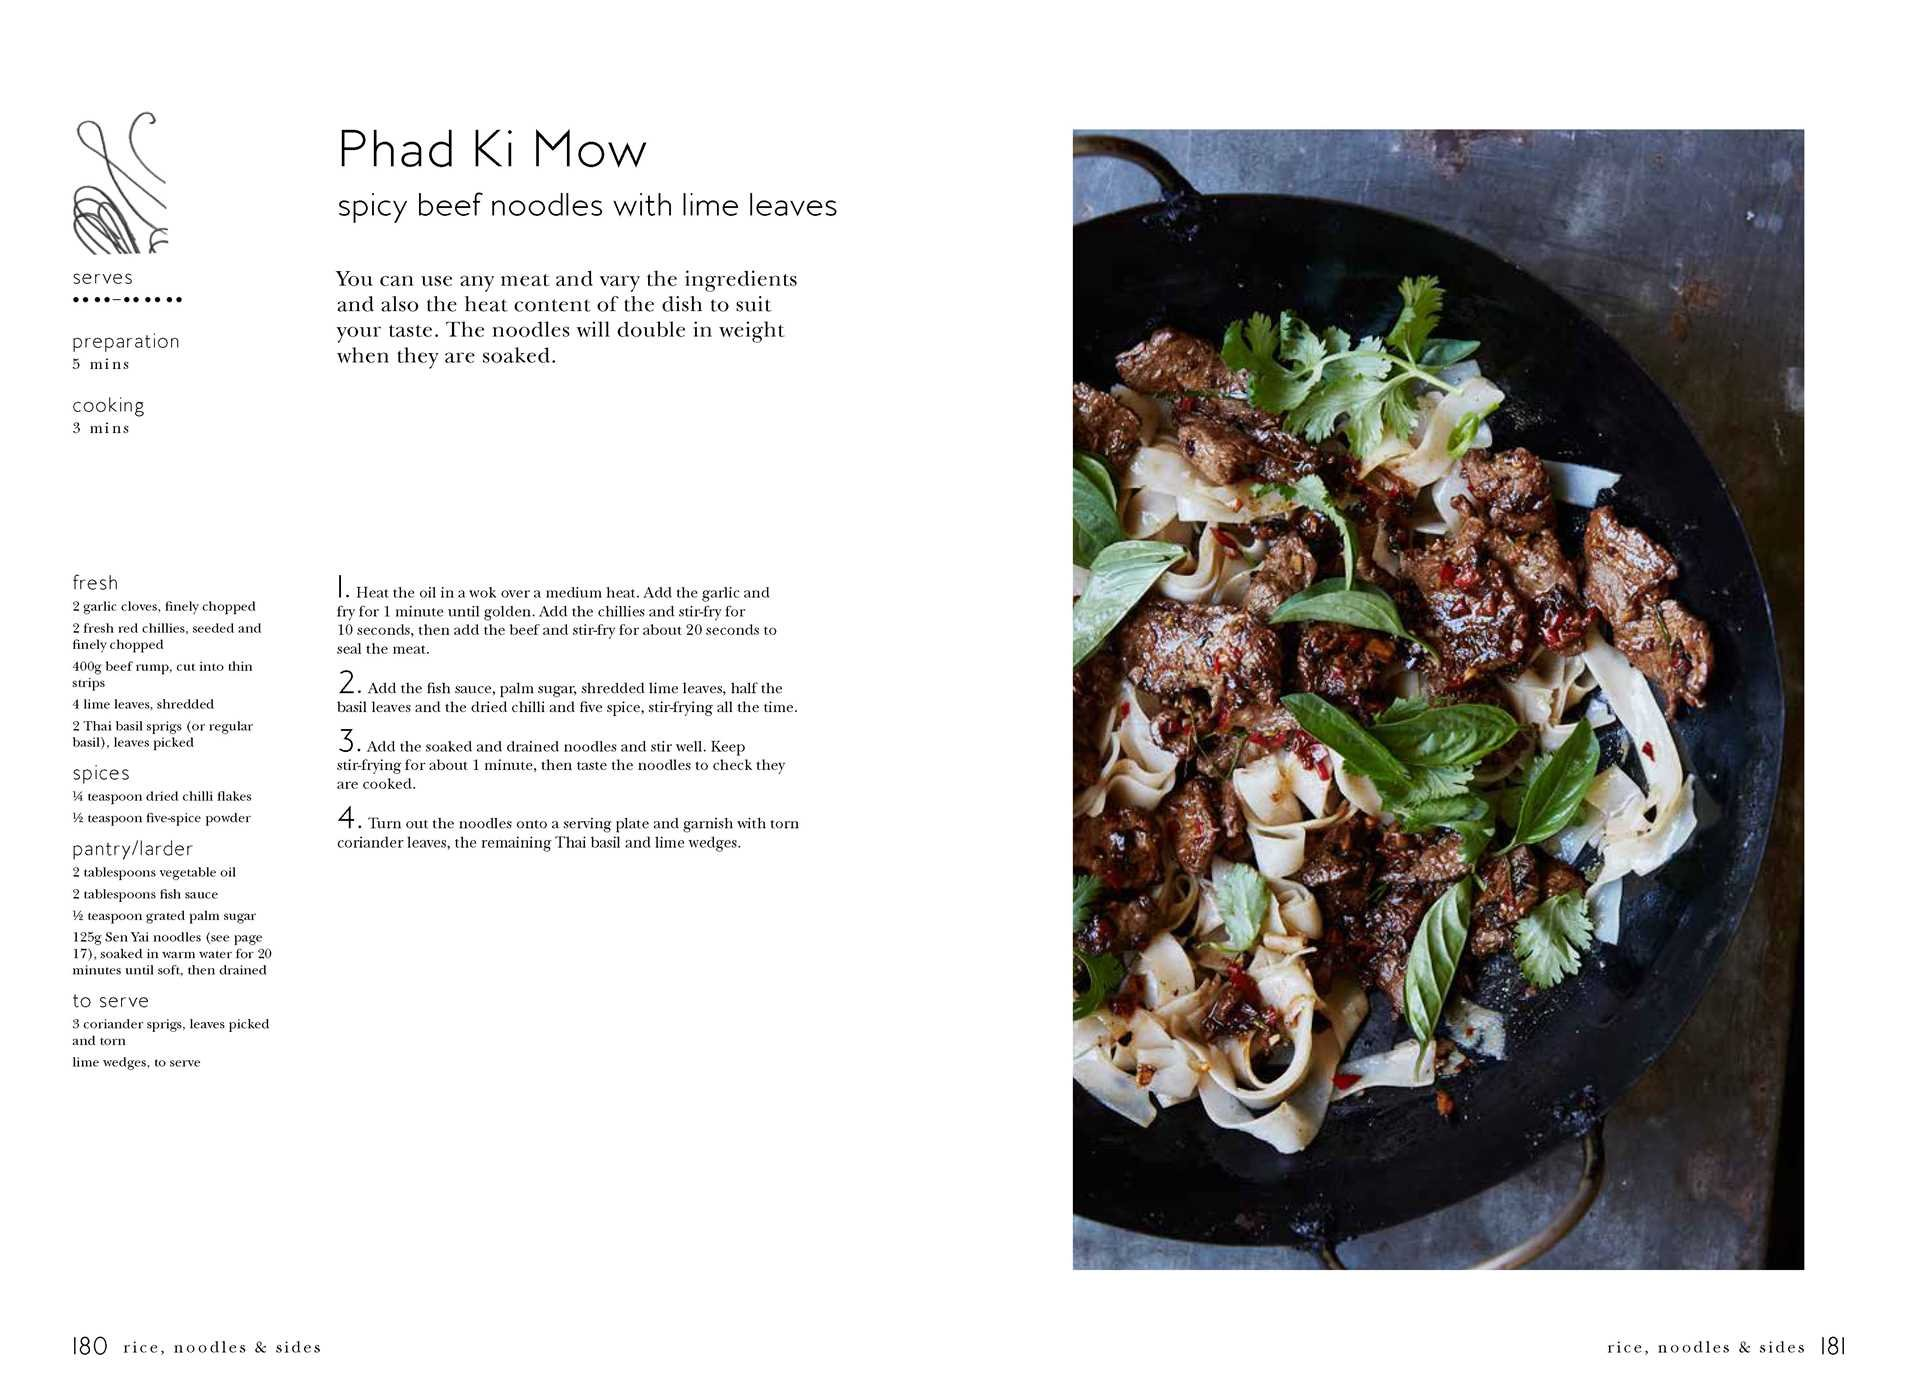 My Thai Cookbook: Tom Kime: 9781681883021: Amazon.com: Books